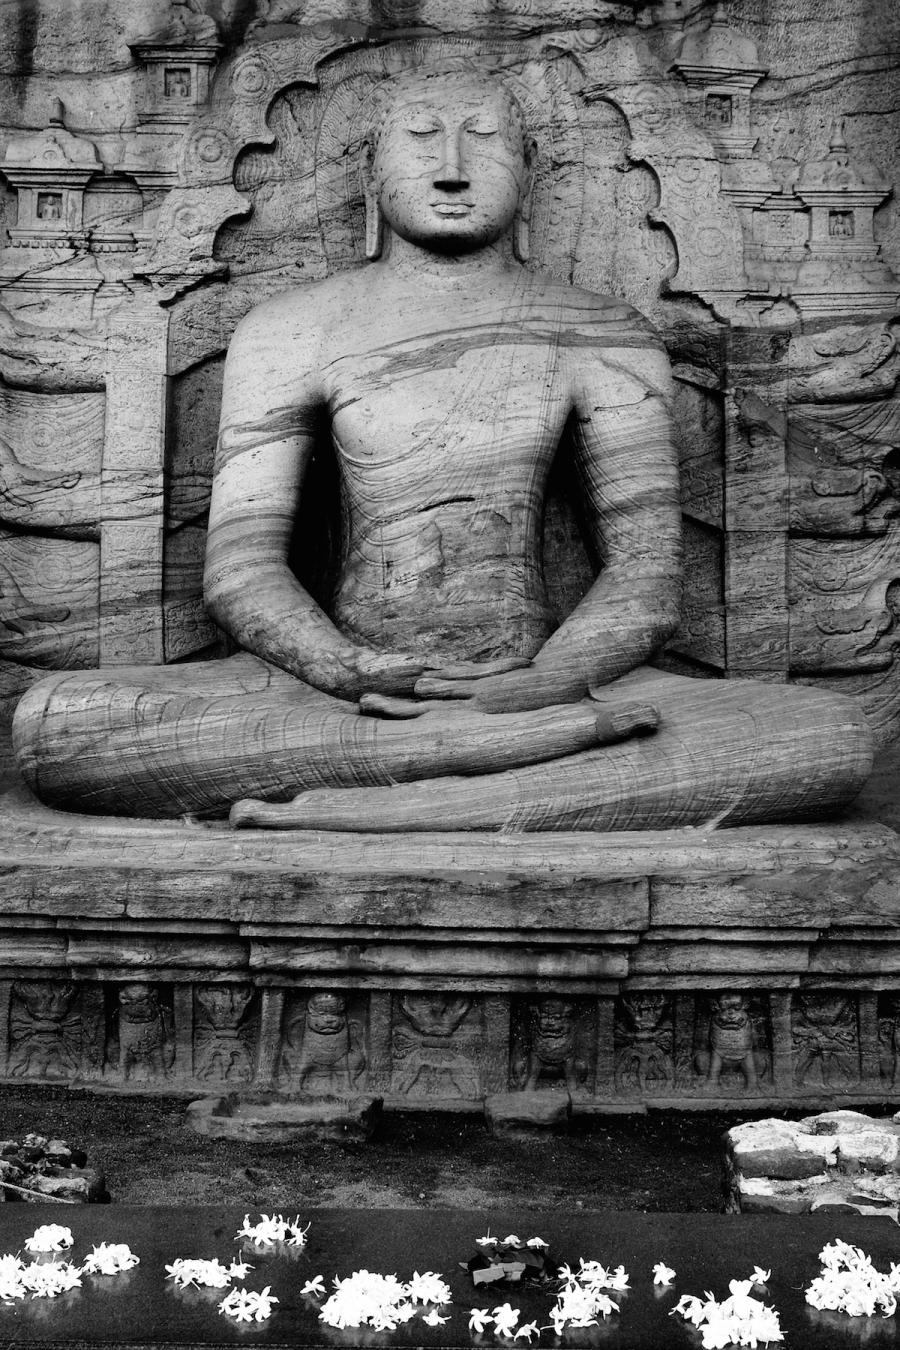 Polonnuwara buddha black and white